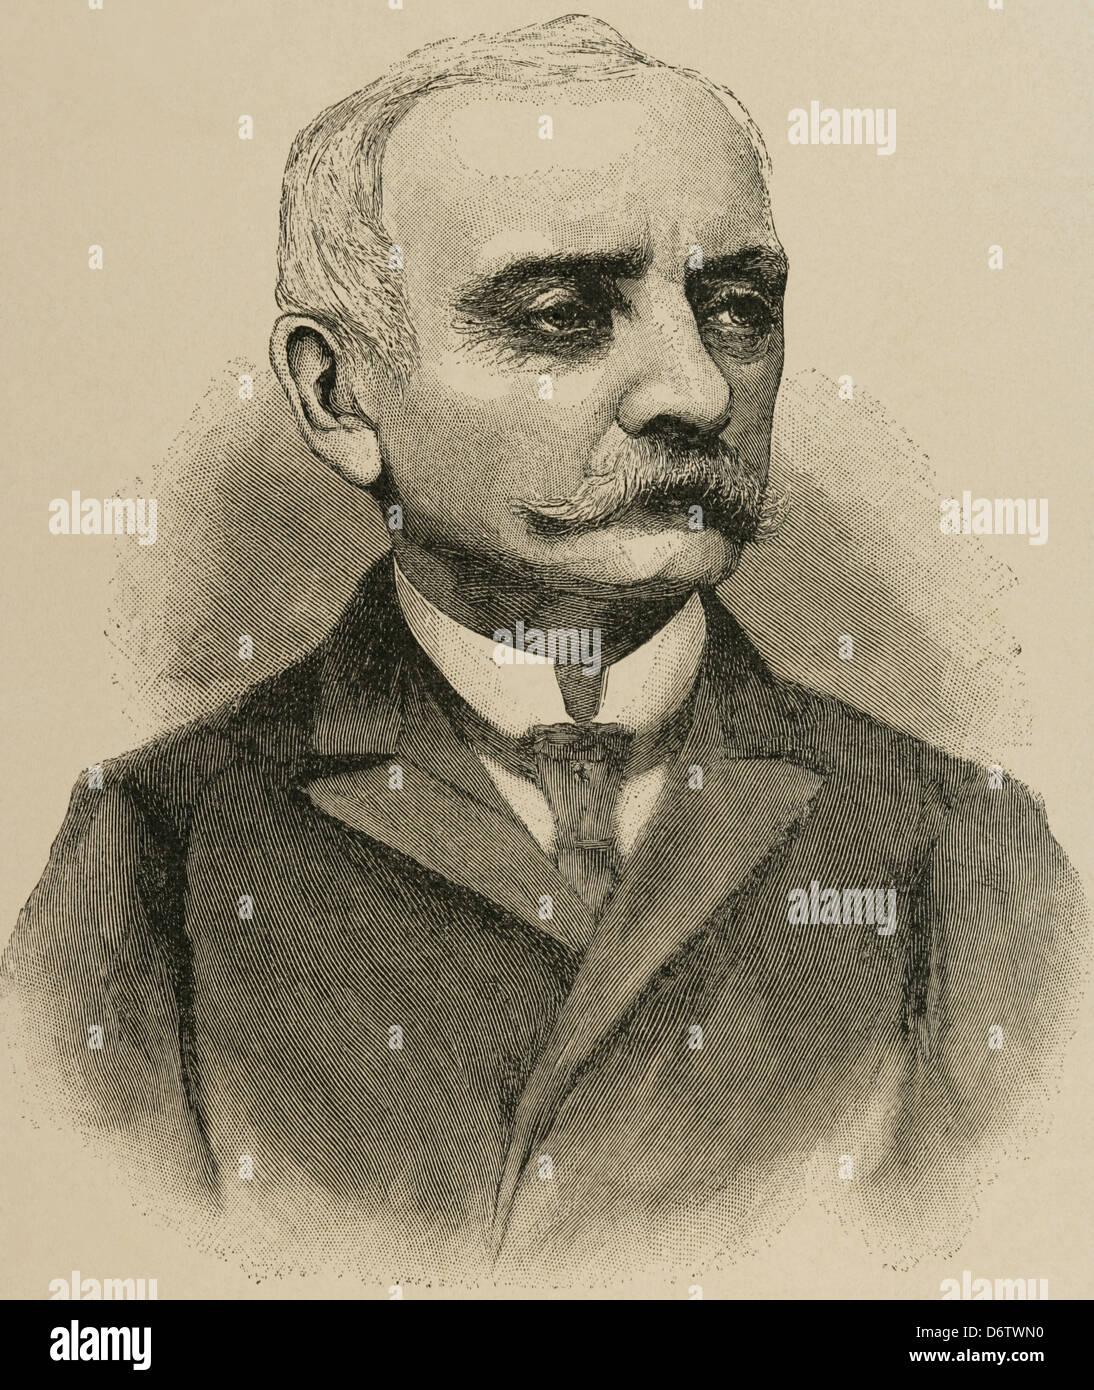 Chlodwig Carl Viktor (1819-1901). German statesman. Engraving. - Stock Image